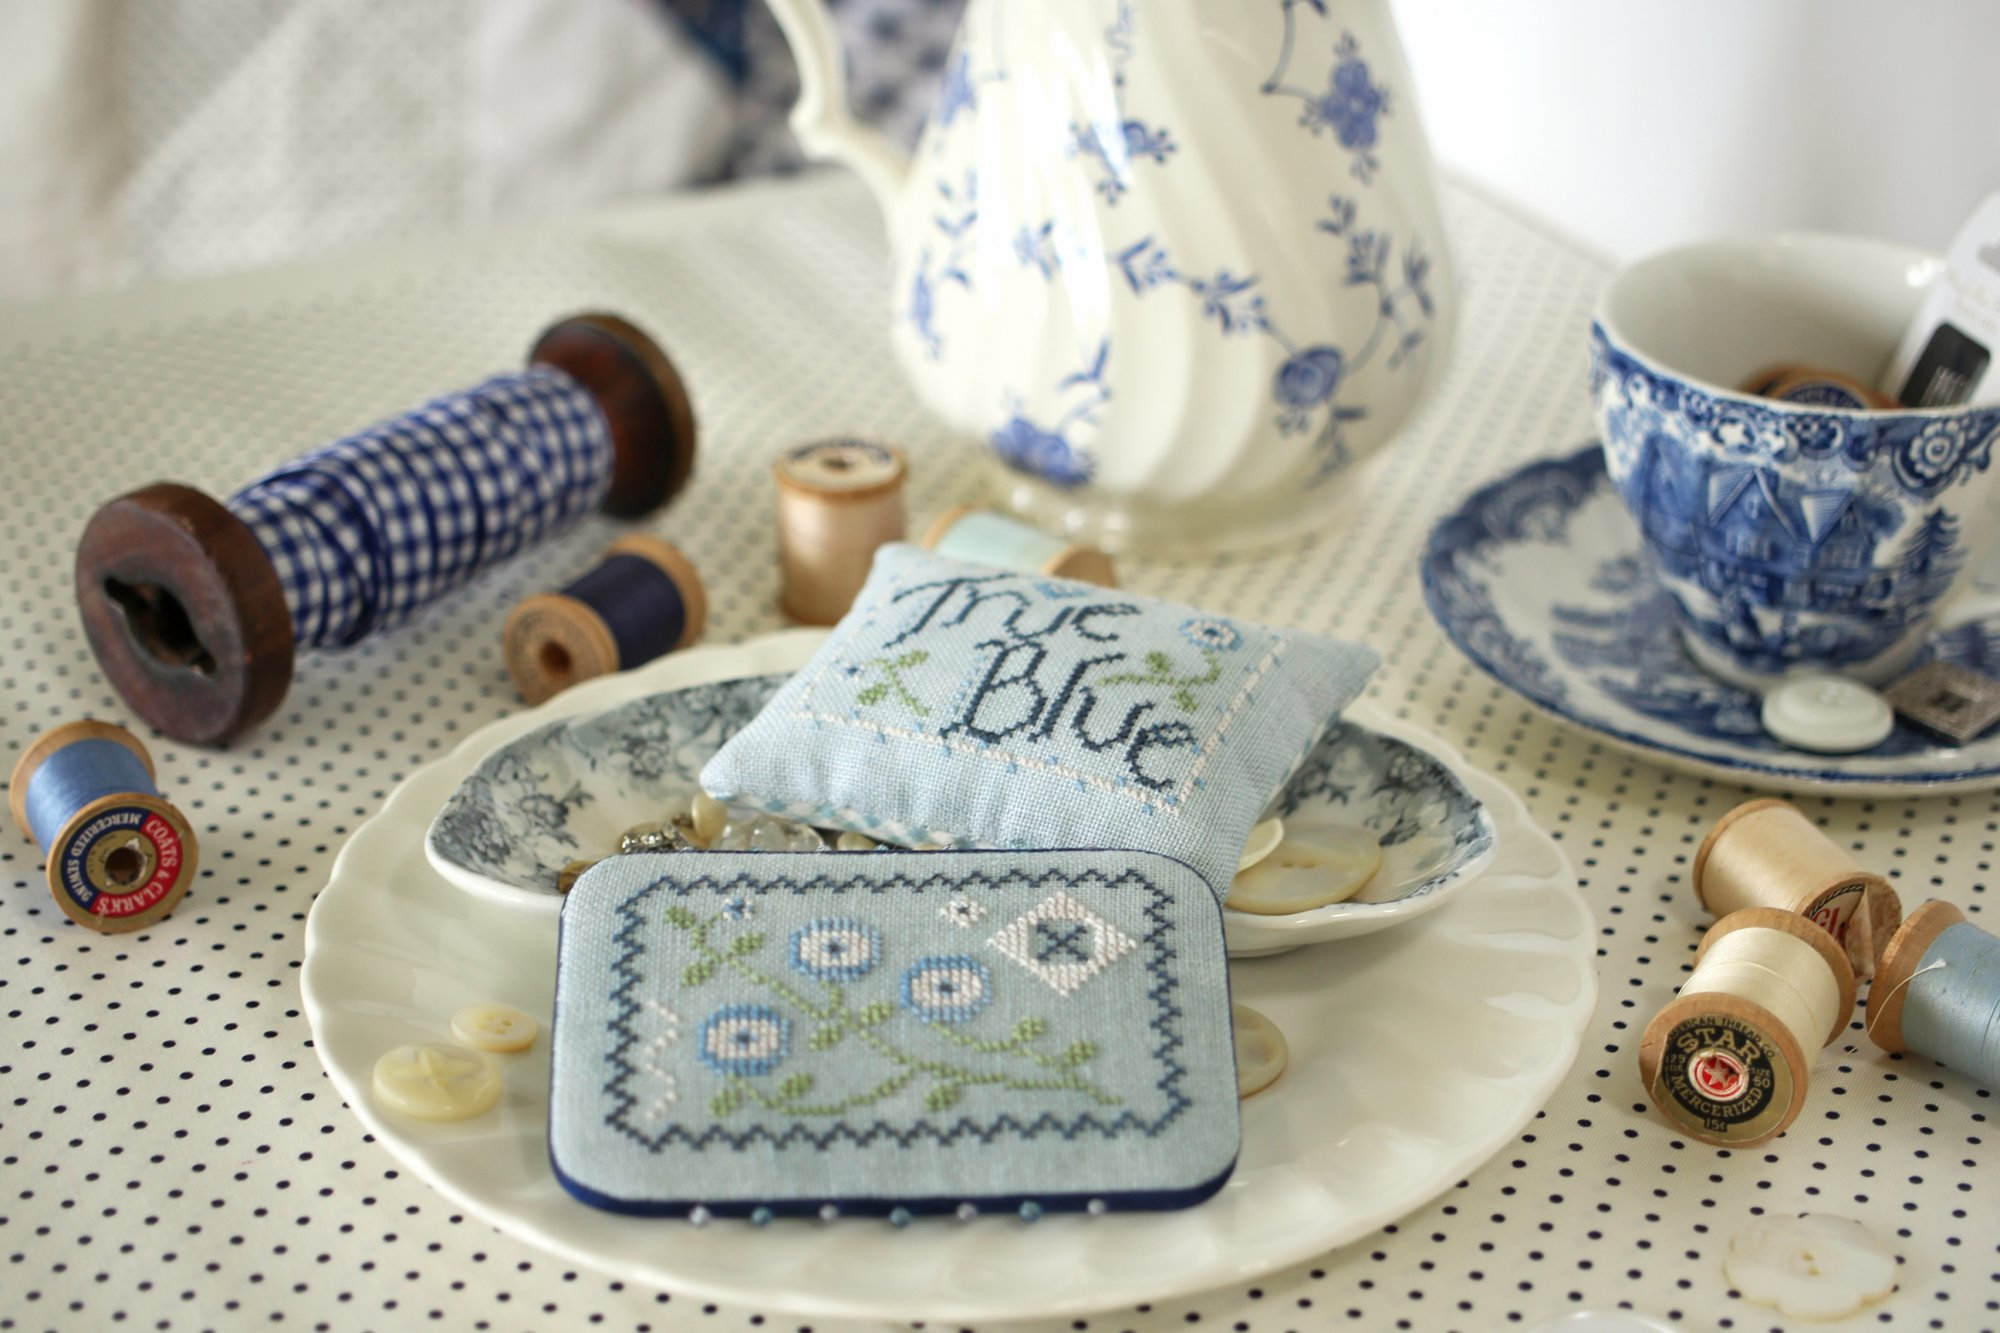 OHFA True Blue